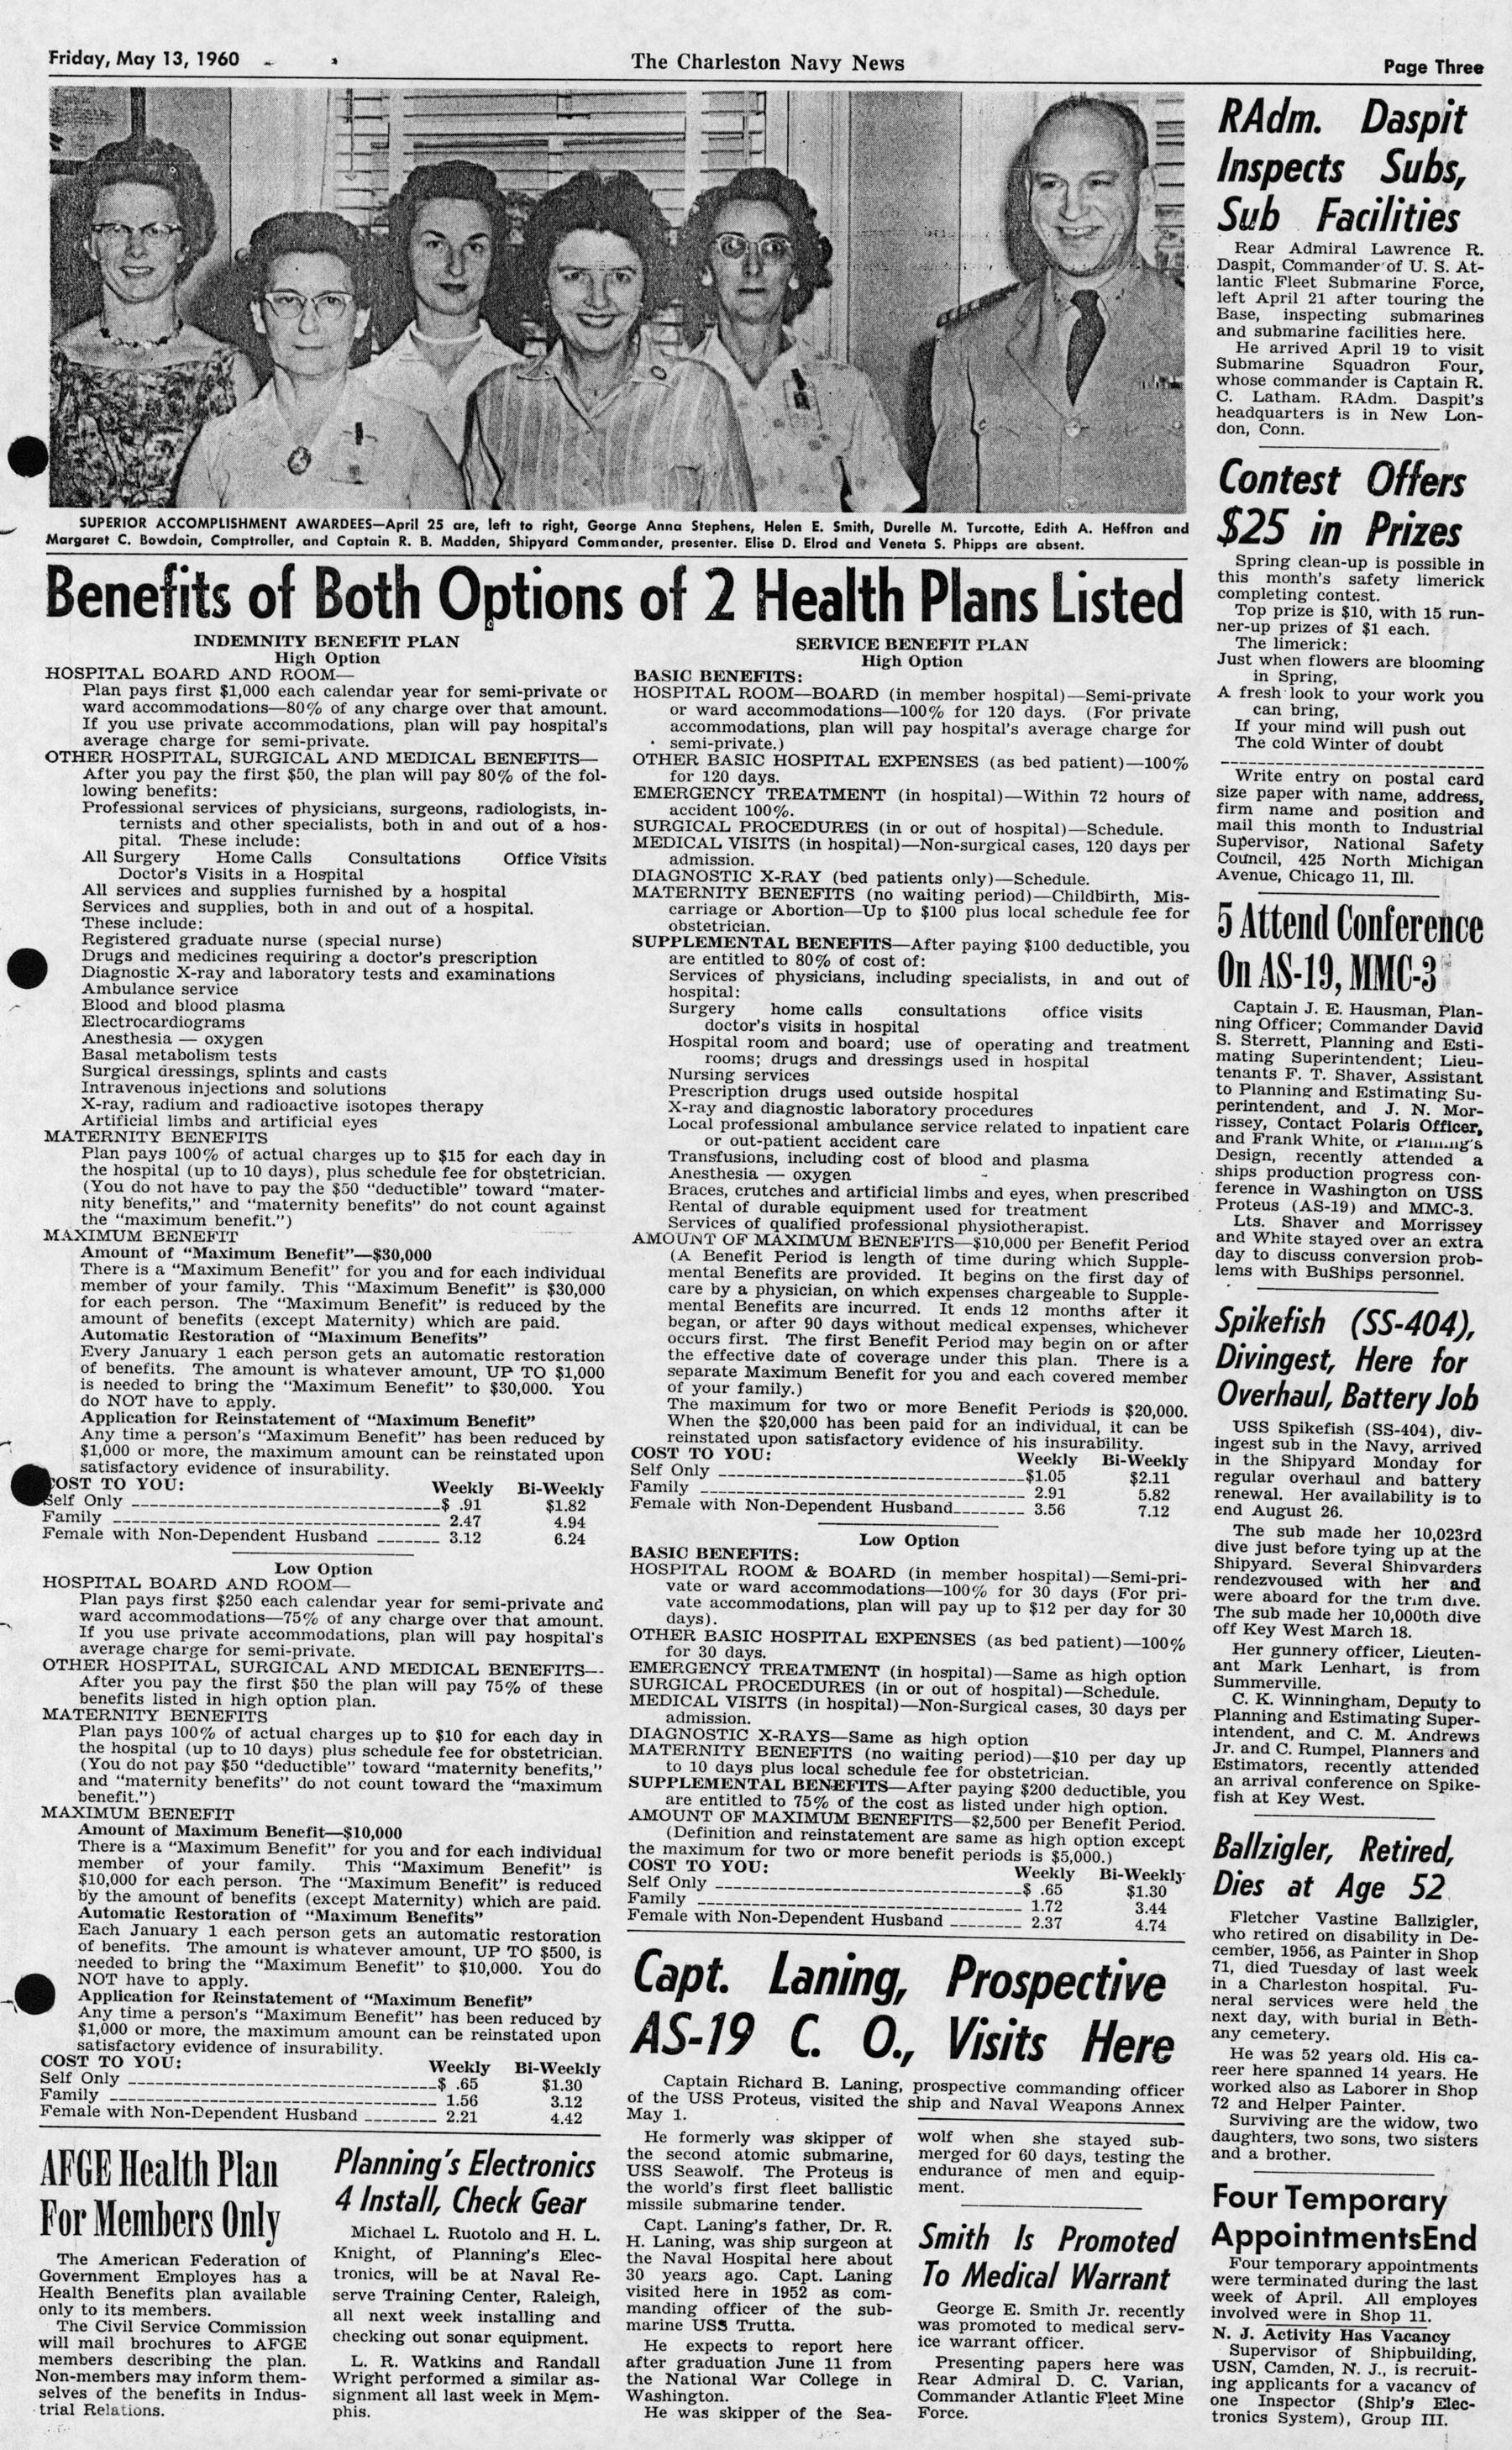 The Charleston Navy News, Volume 18, Edition 22, page iii